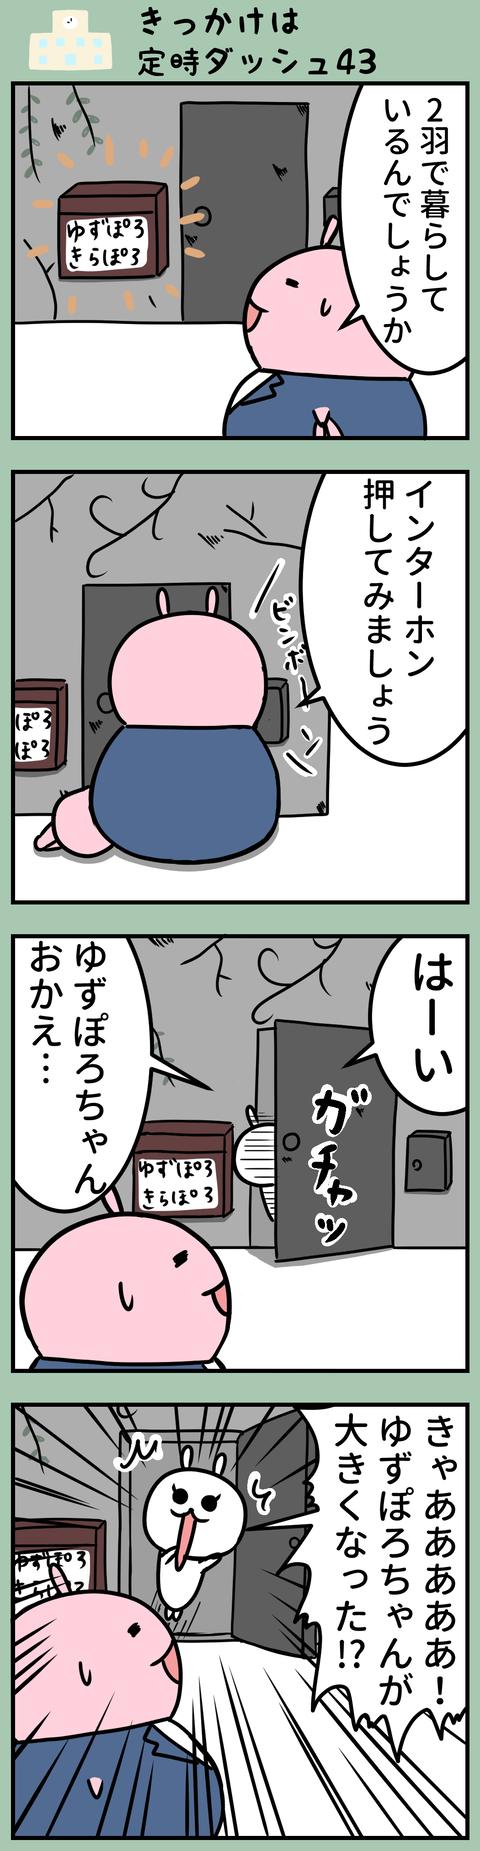 manga-yuzuporo114-1